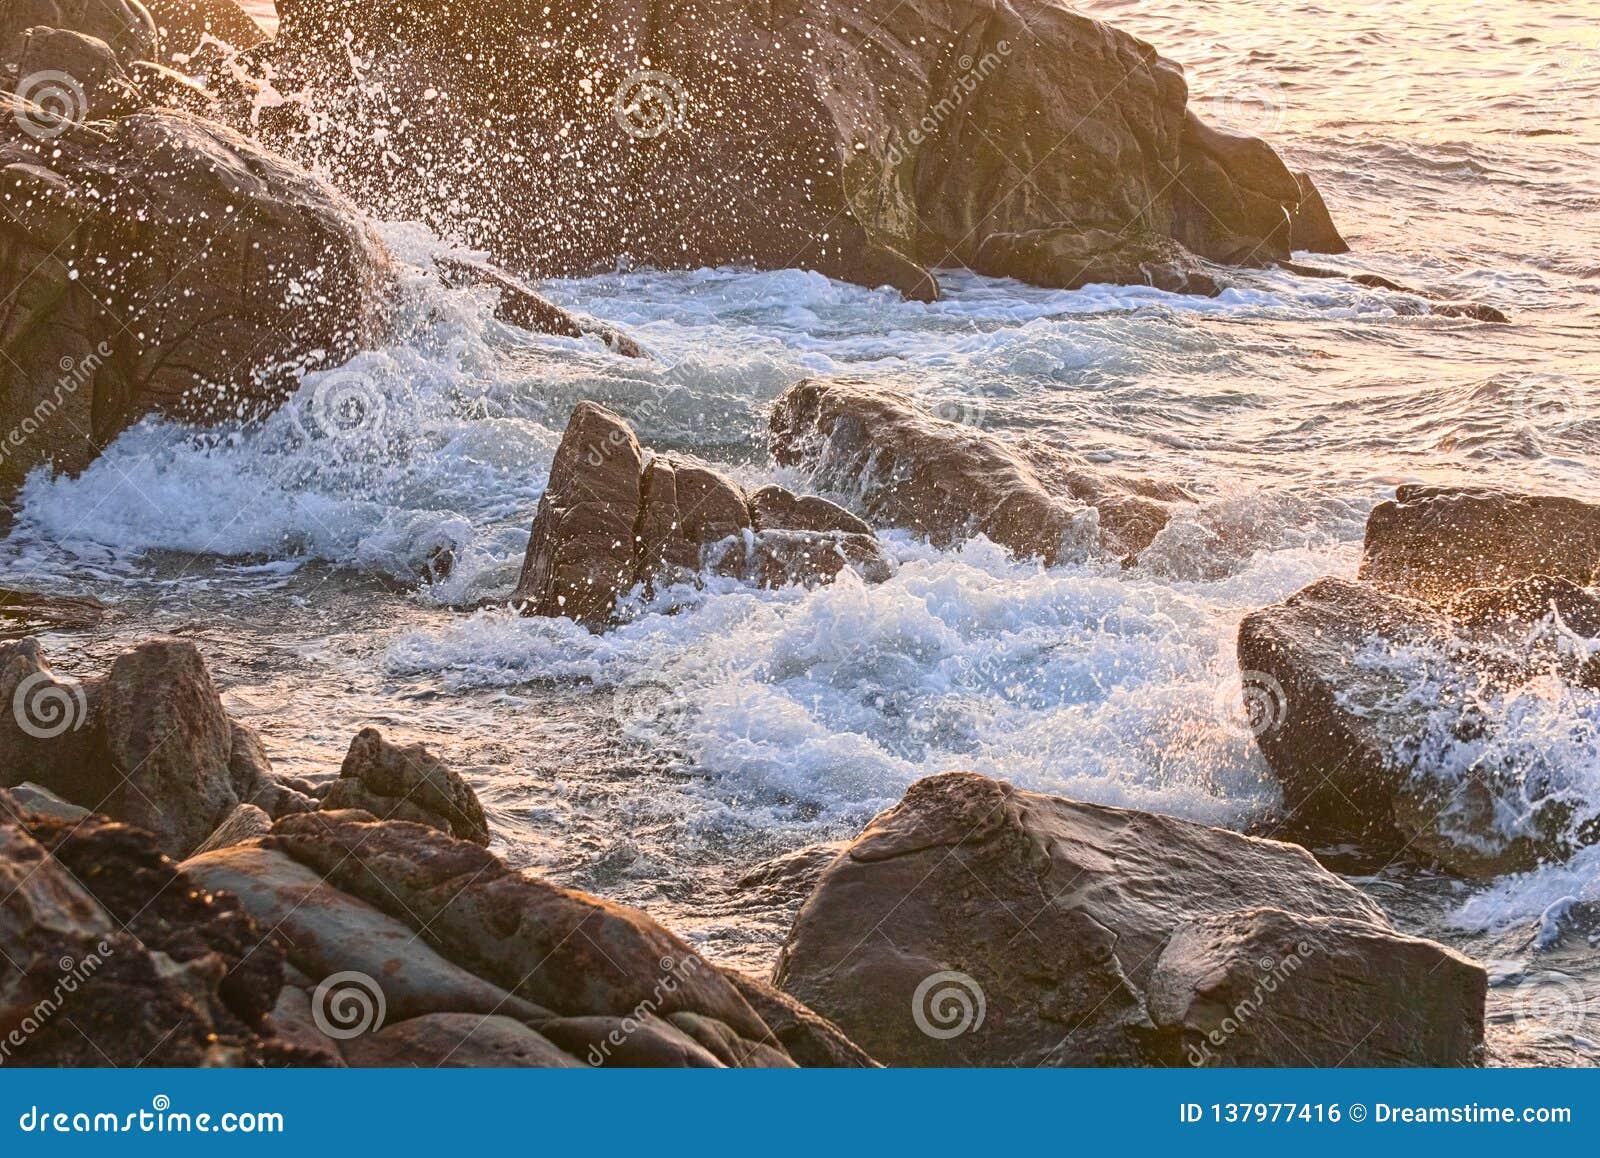 Sea waves crashing on coastal rocks in the rays